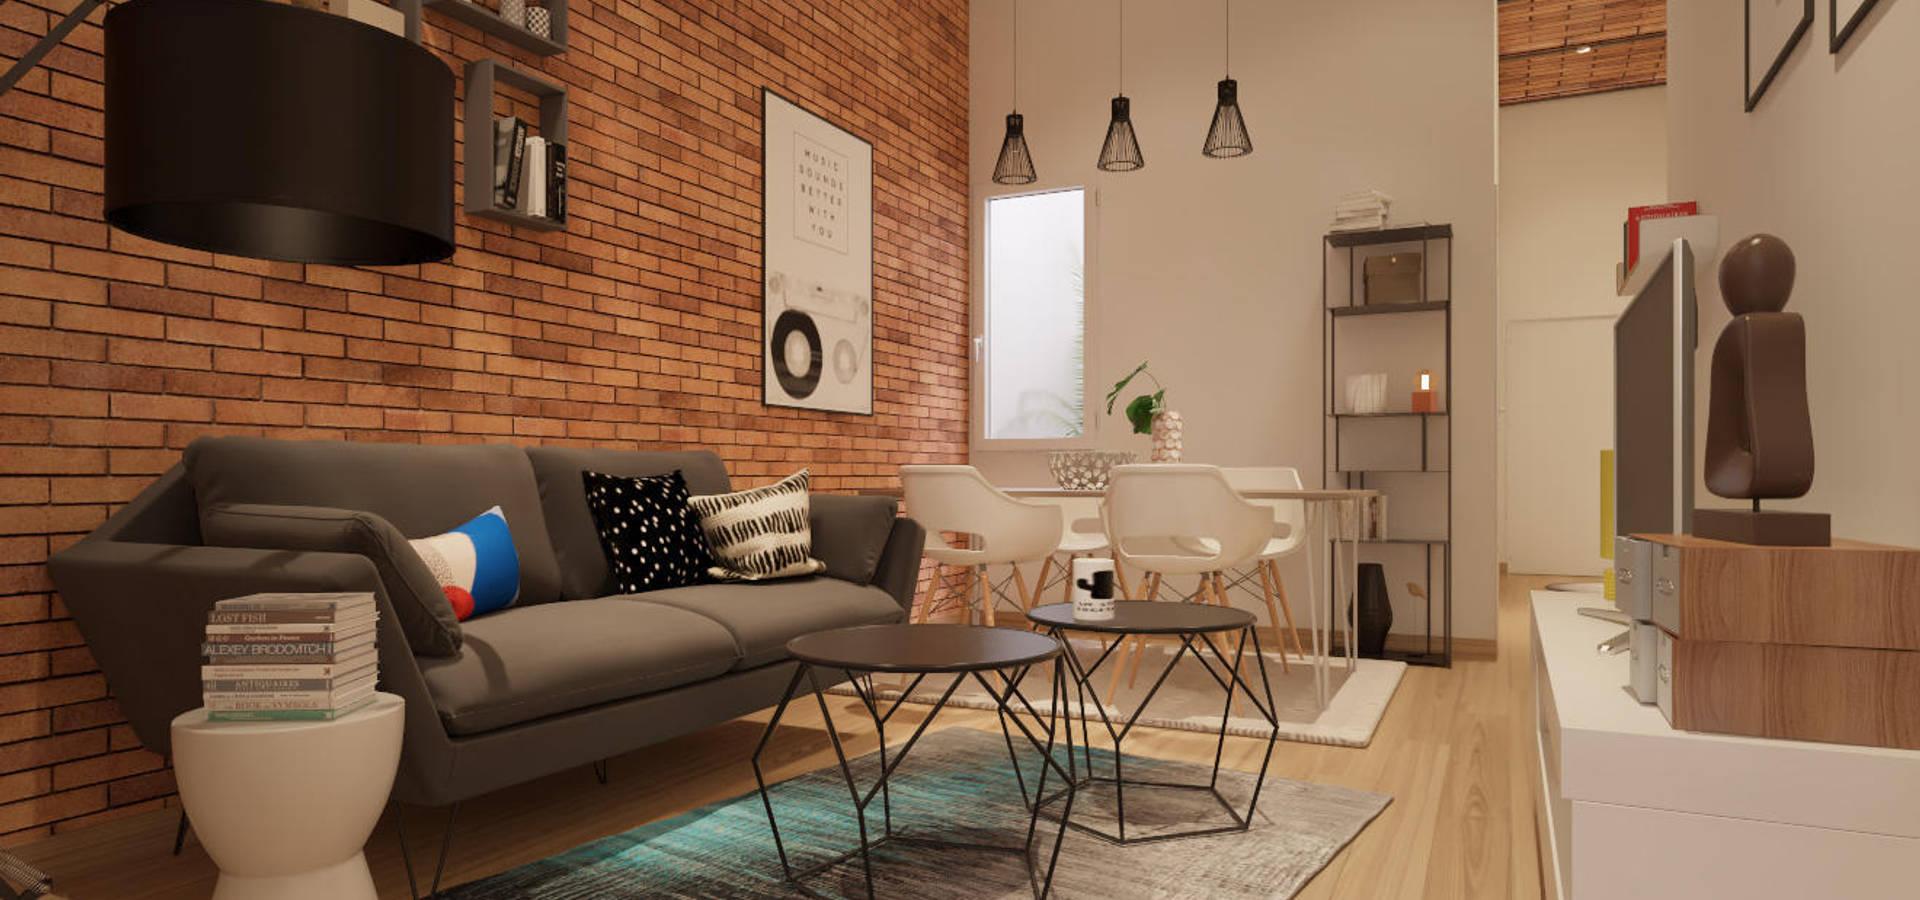 Easy home staging decoradores y dise adores de interiores - Barcelona home staging ...